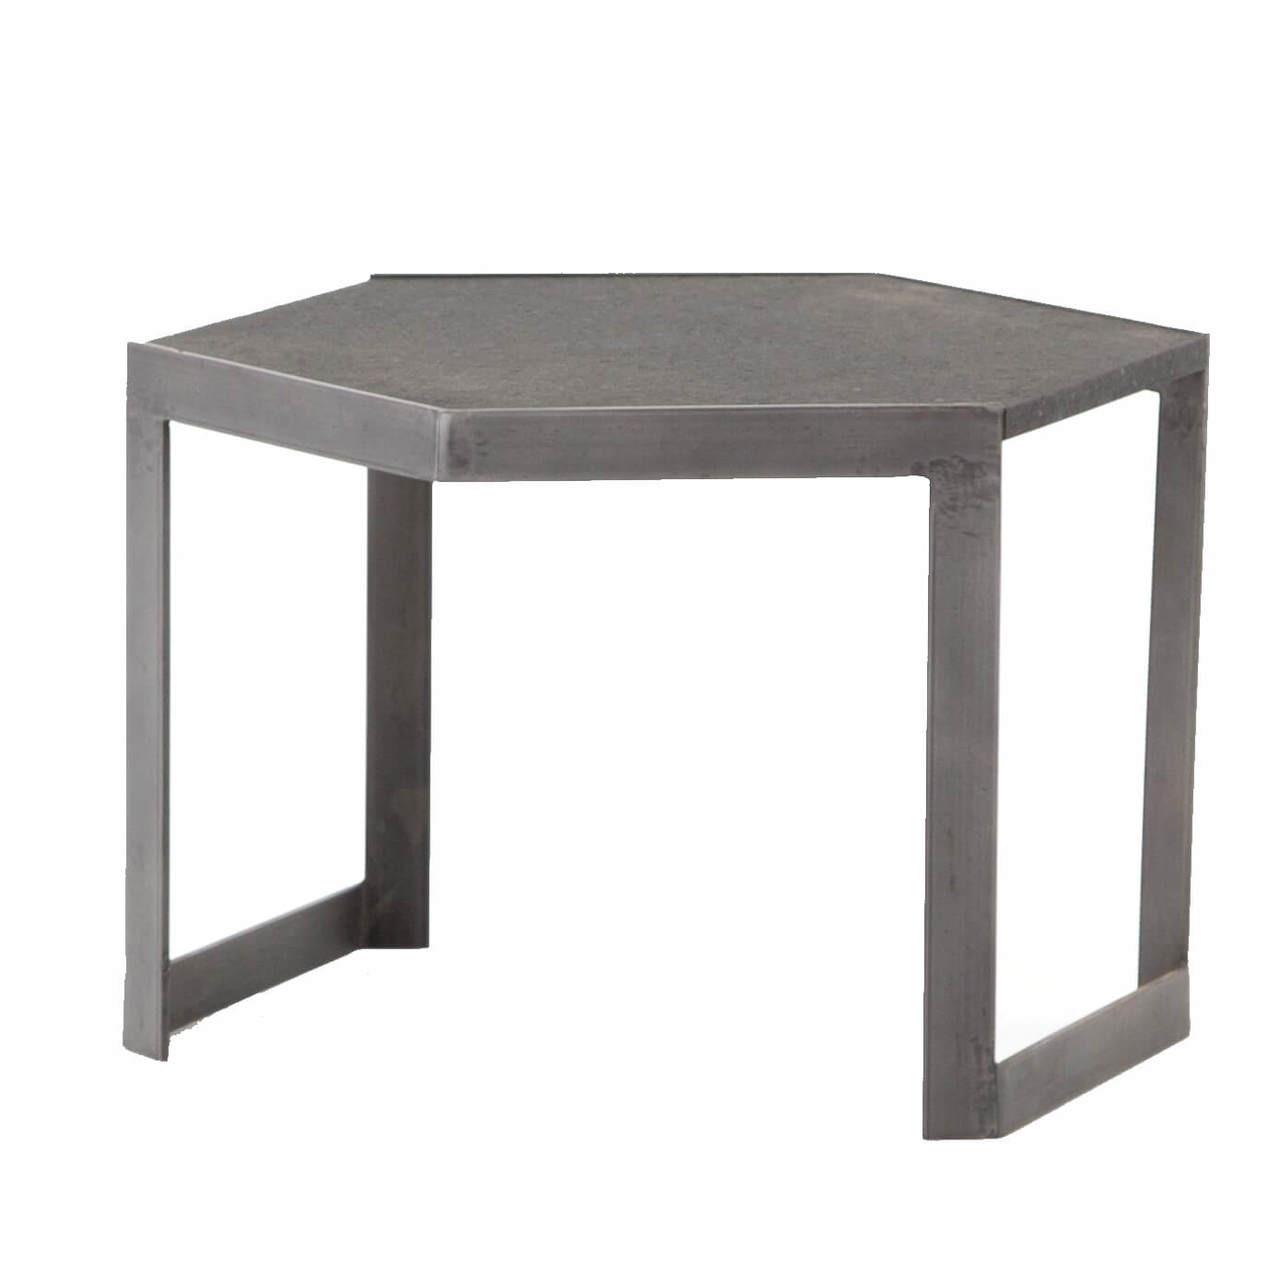 Clint Iron + Granite Top Hexagonal Bunching Coffee Table